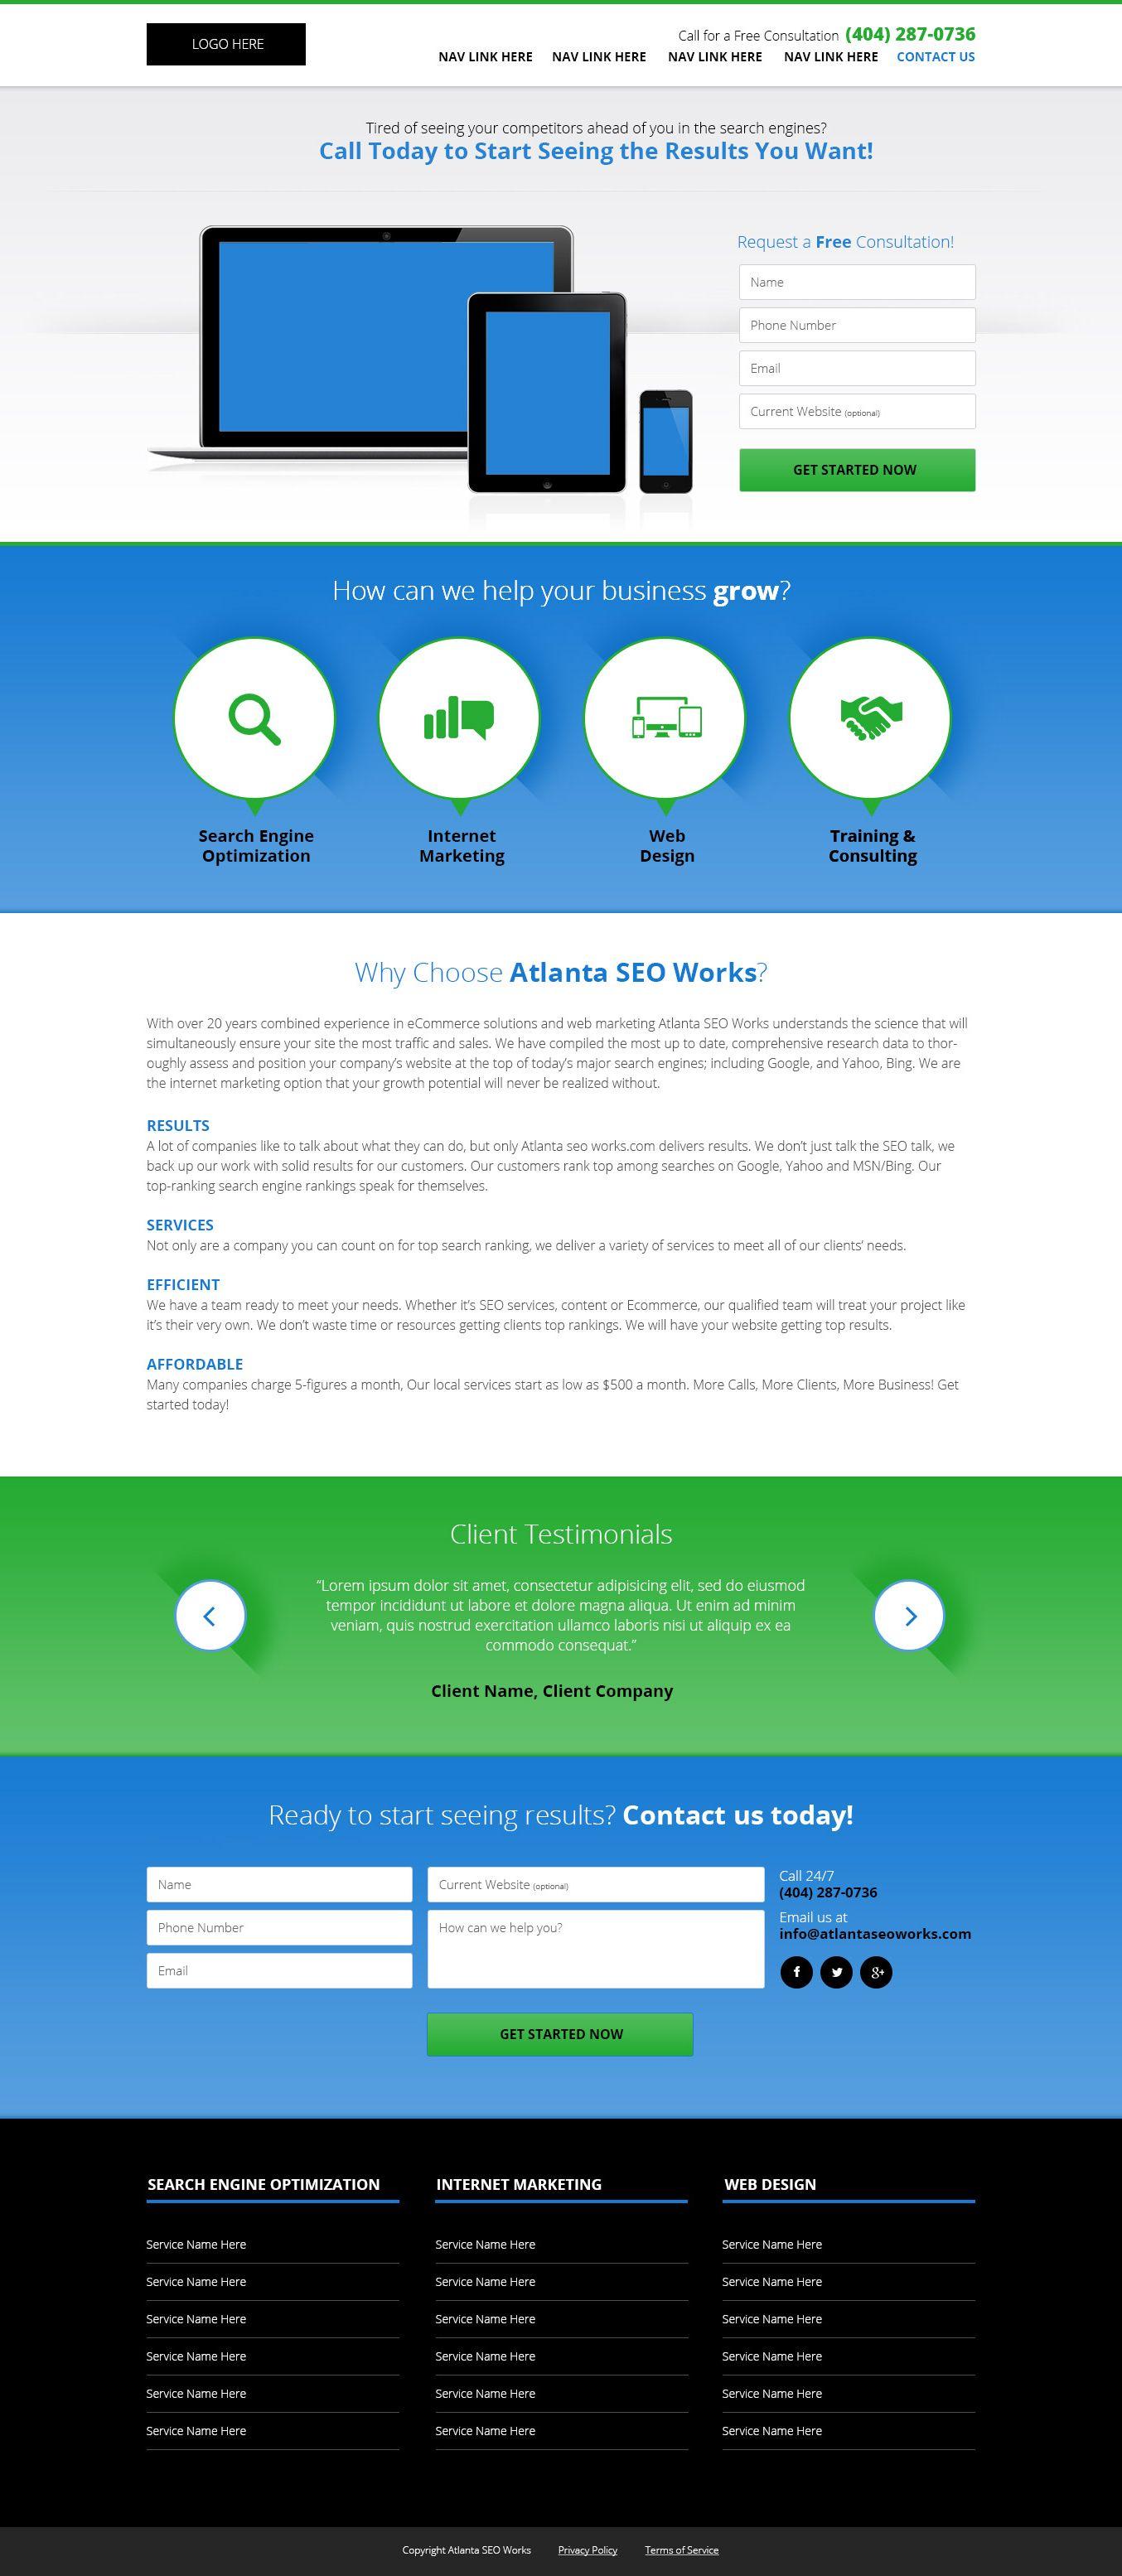 Website Design For An Internet Marketing Company Website Design Internet Marketing Company Portfolio Web Design